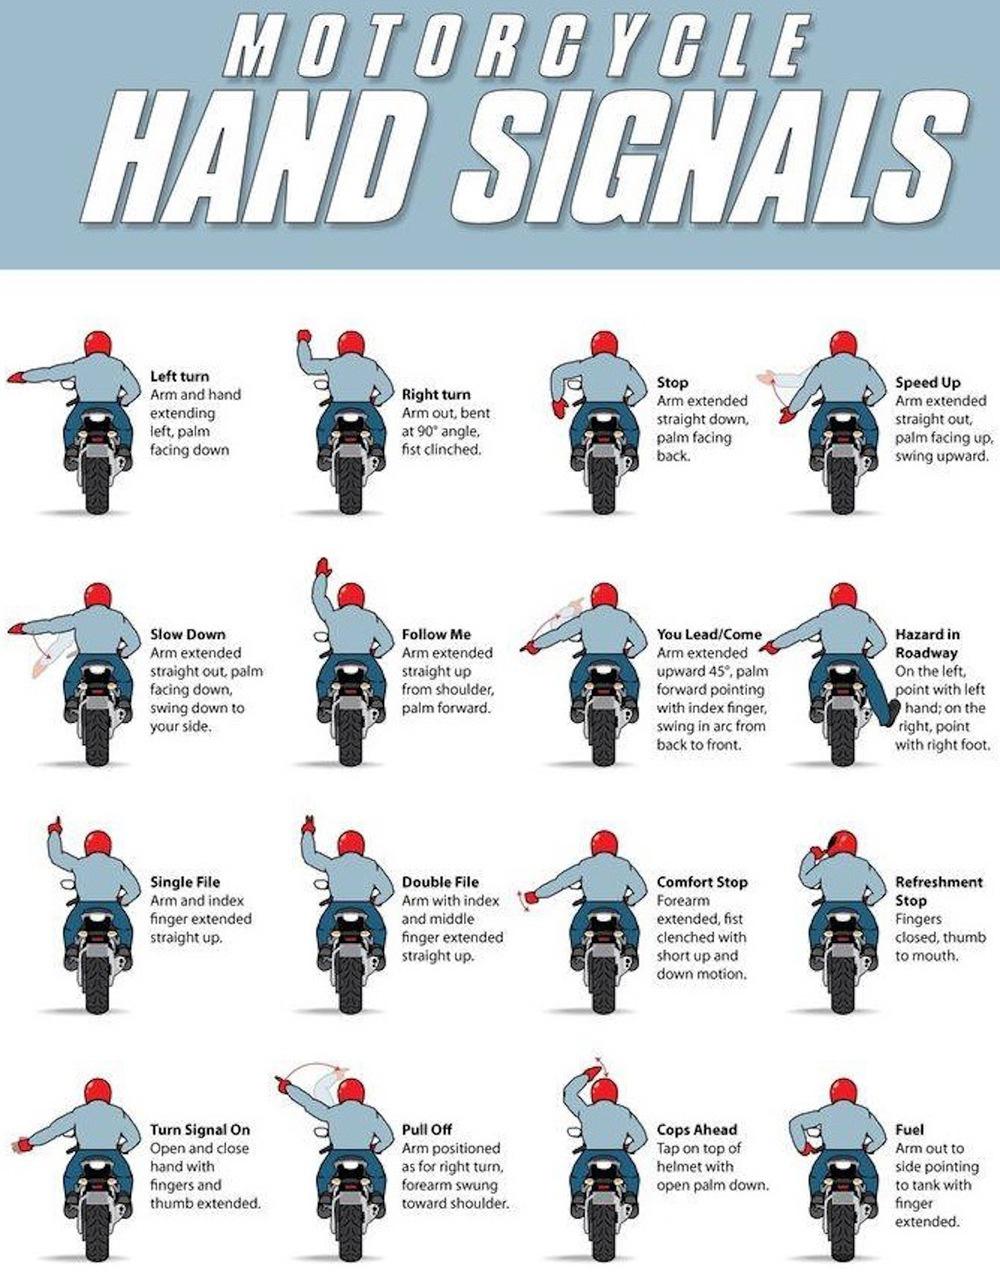 Motorcycle-Hand-Signals.jpg